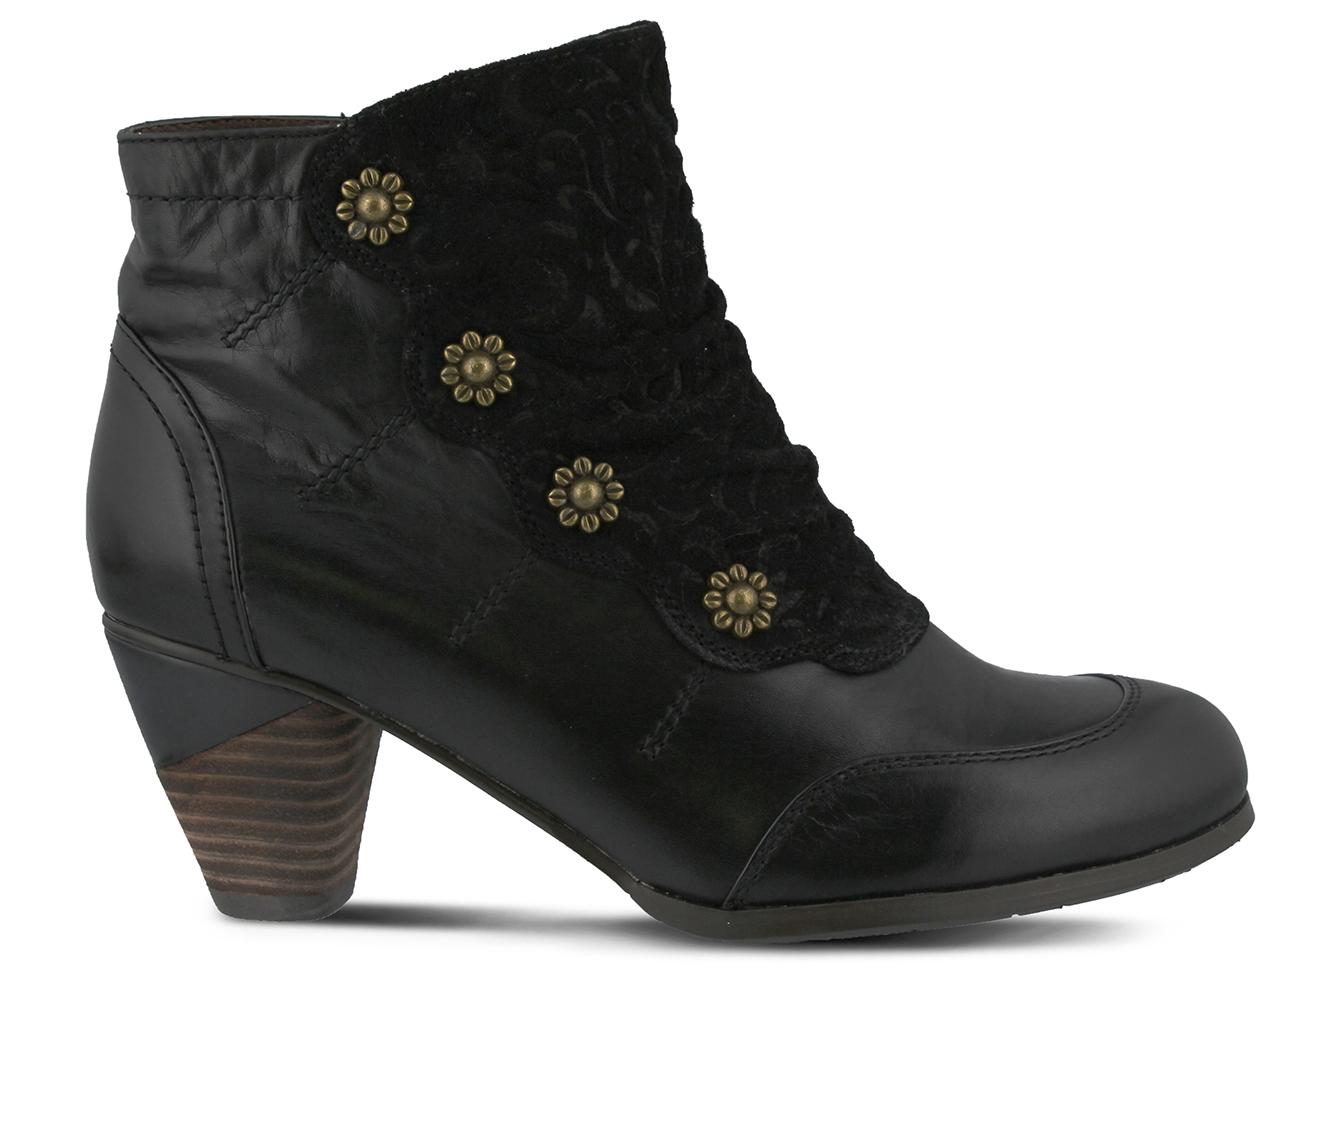 L'Artiste Belgard Women's Boots (Black Leather)